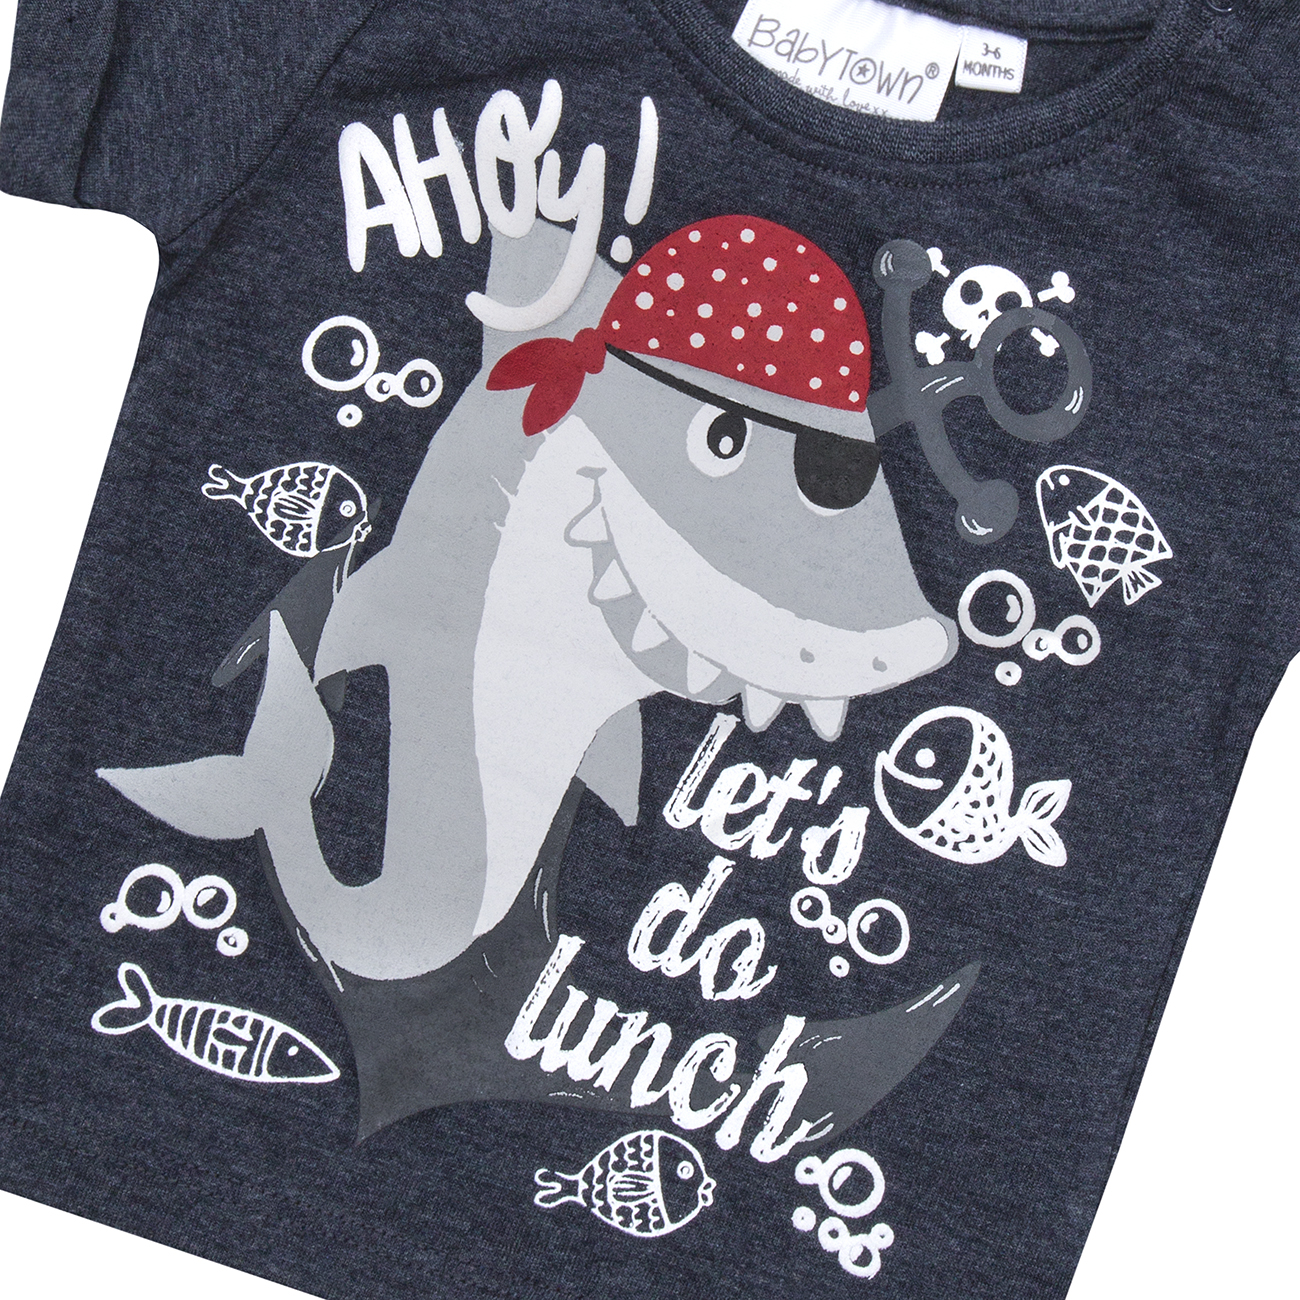 BABYTOWN Newborn Baby Boys Novelty T-Shirts Cotton Rich Character Tops 0-24m